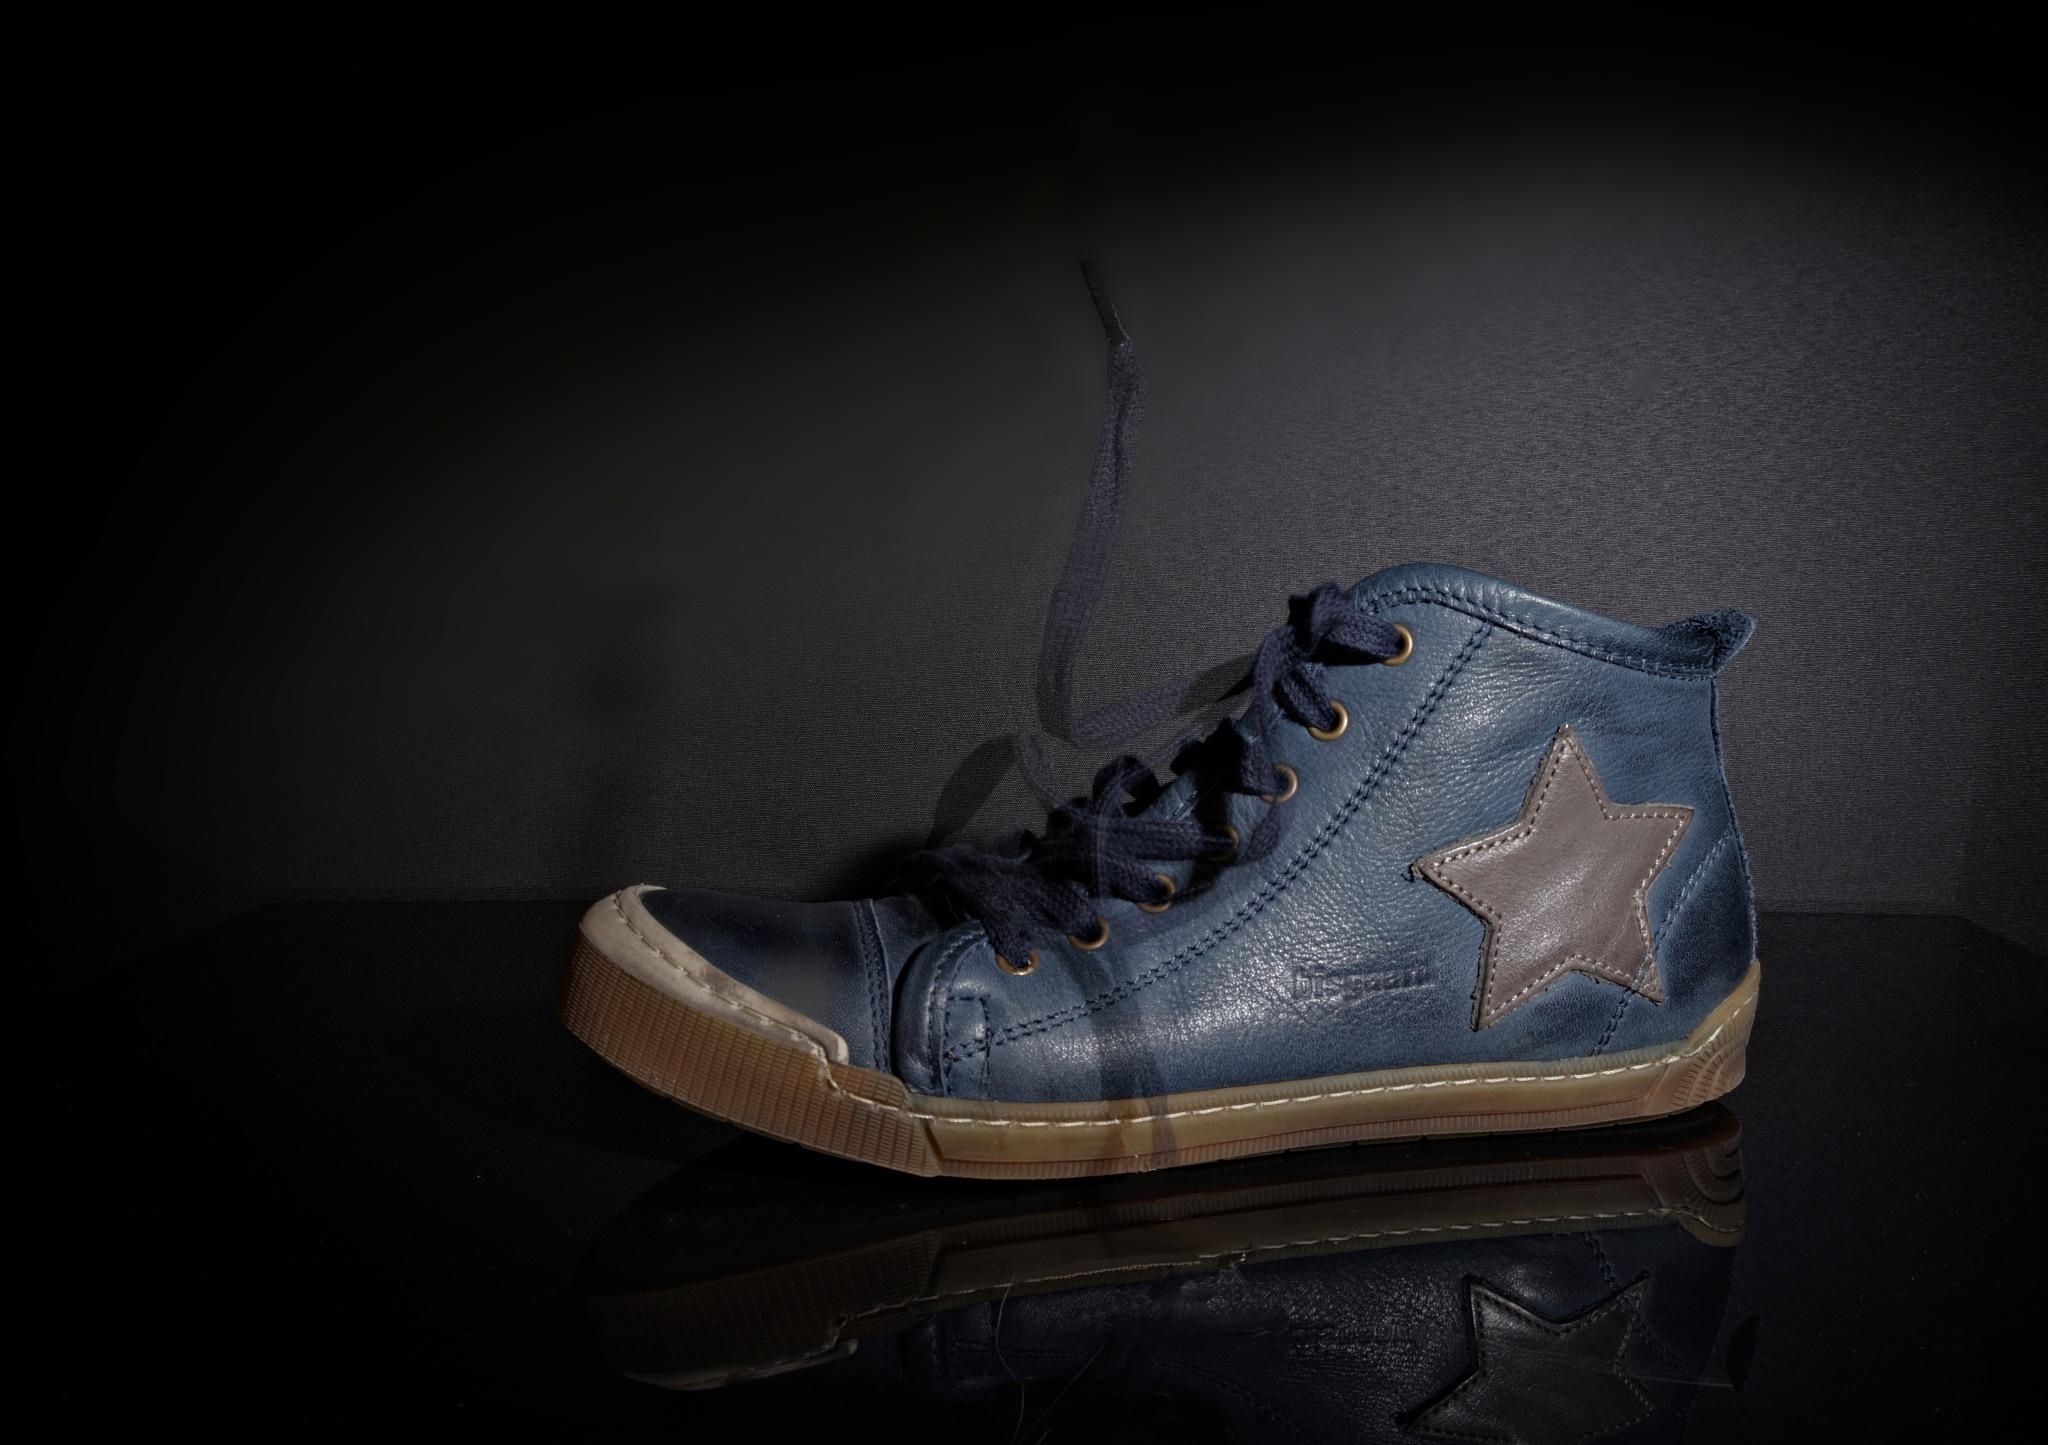 Shoe by RIwanowski